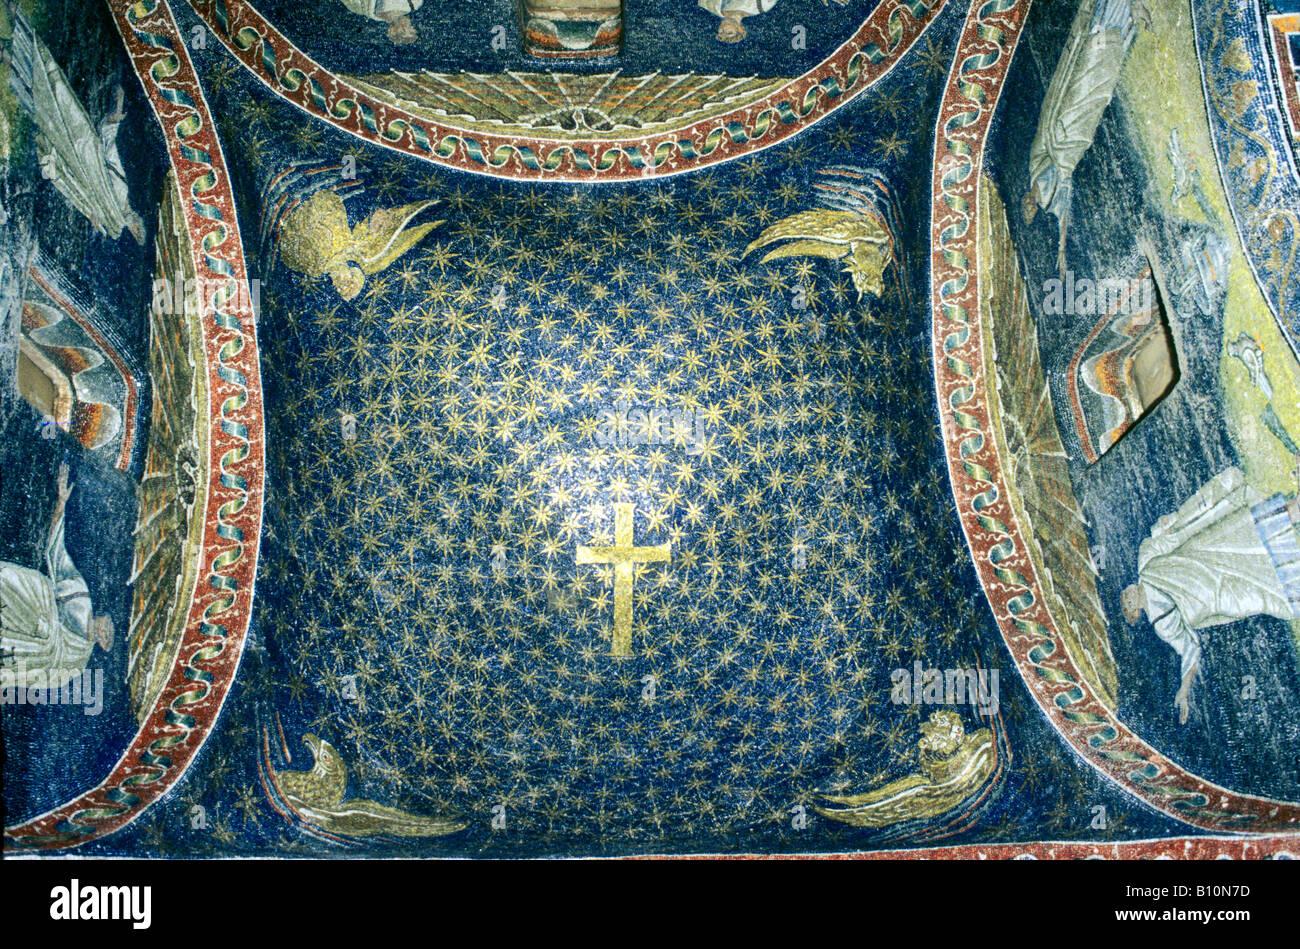 Ancient Art Architecture Collection Ltd Galla Placida Mausoleum mosaic Ravenna 5th c Italy - Stock Image